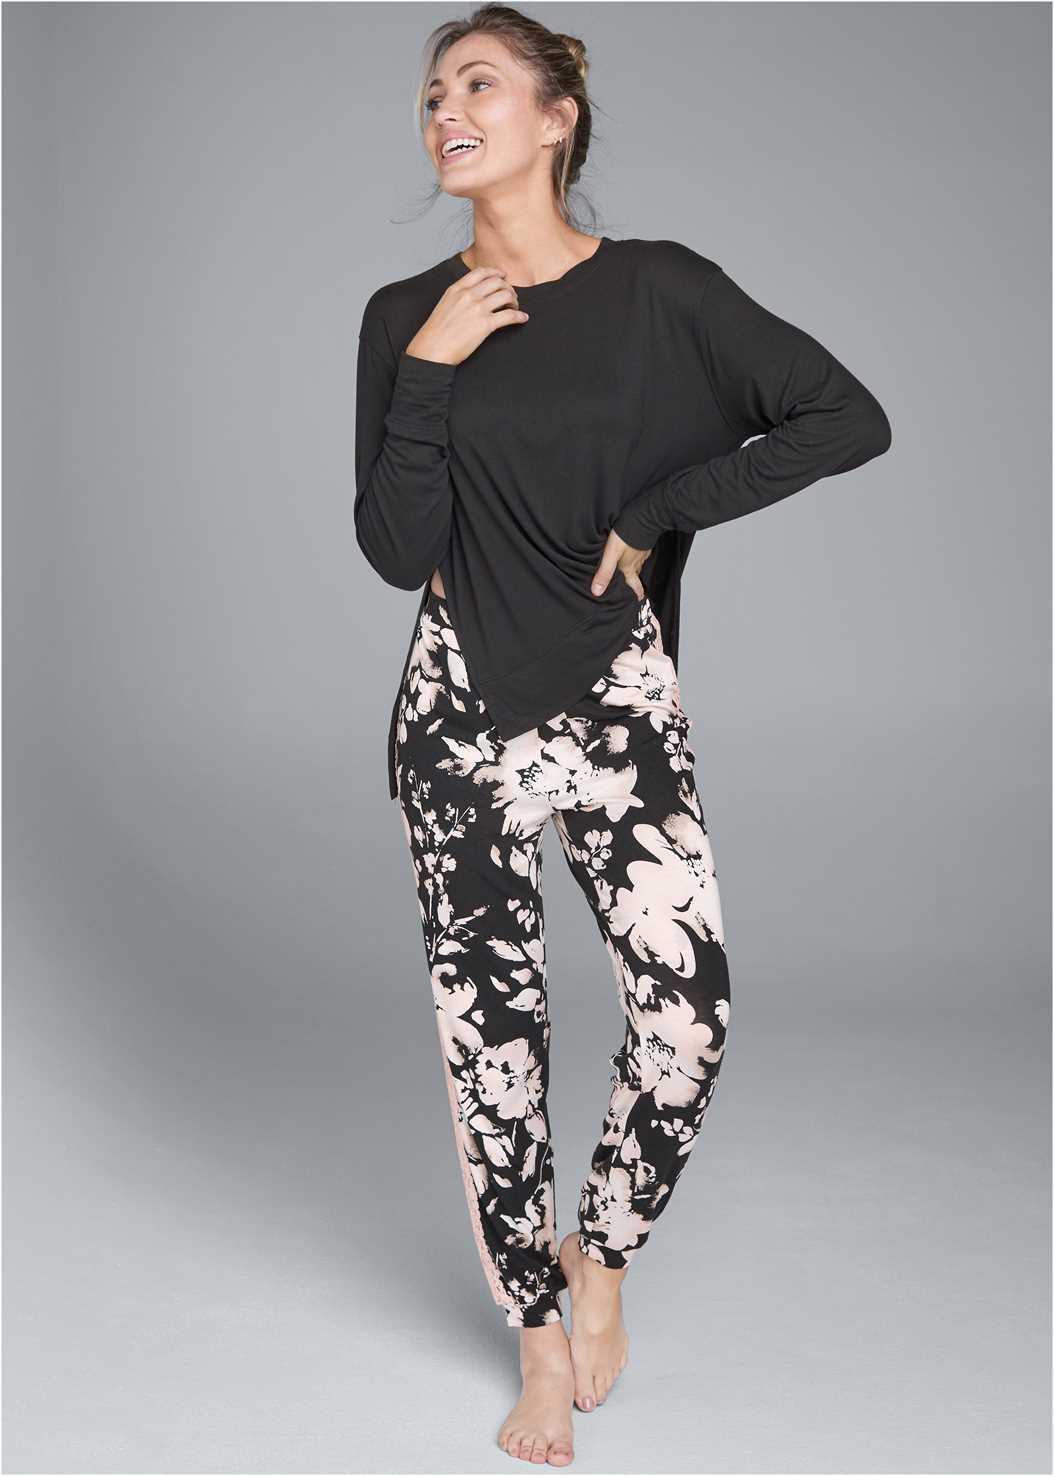 Lace Trim Sleep Pants,Long Sleeve Sleep Shirt